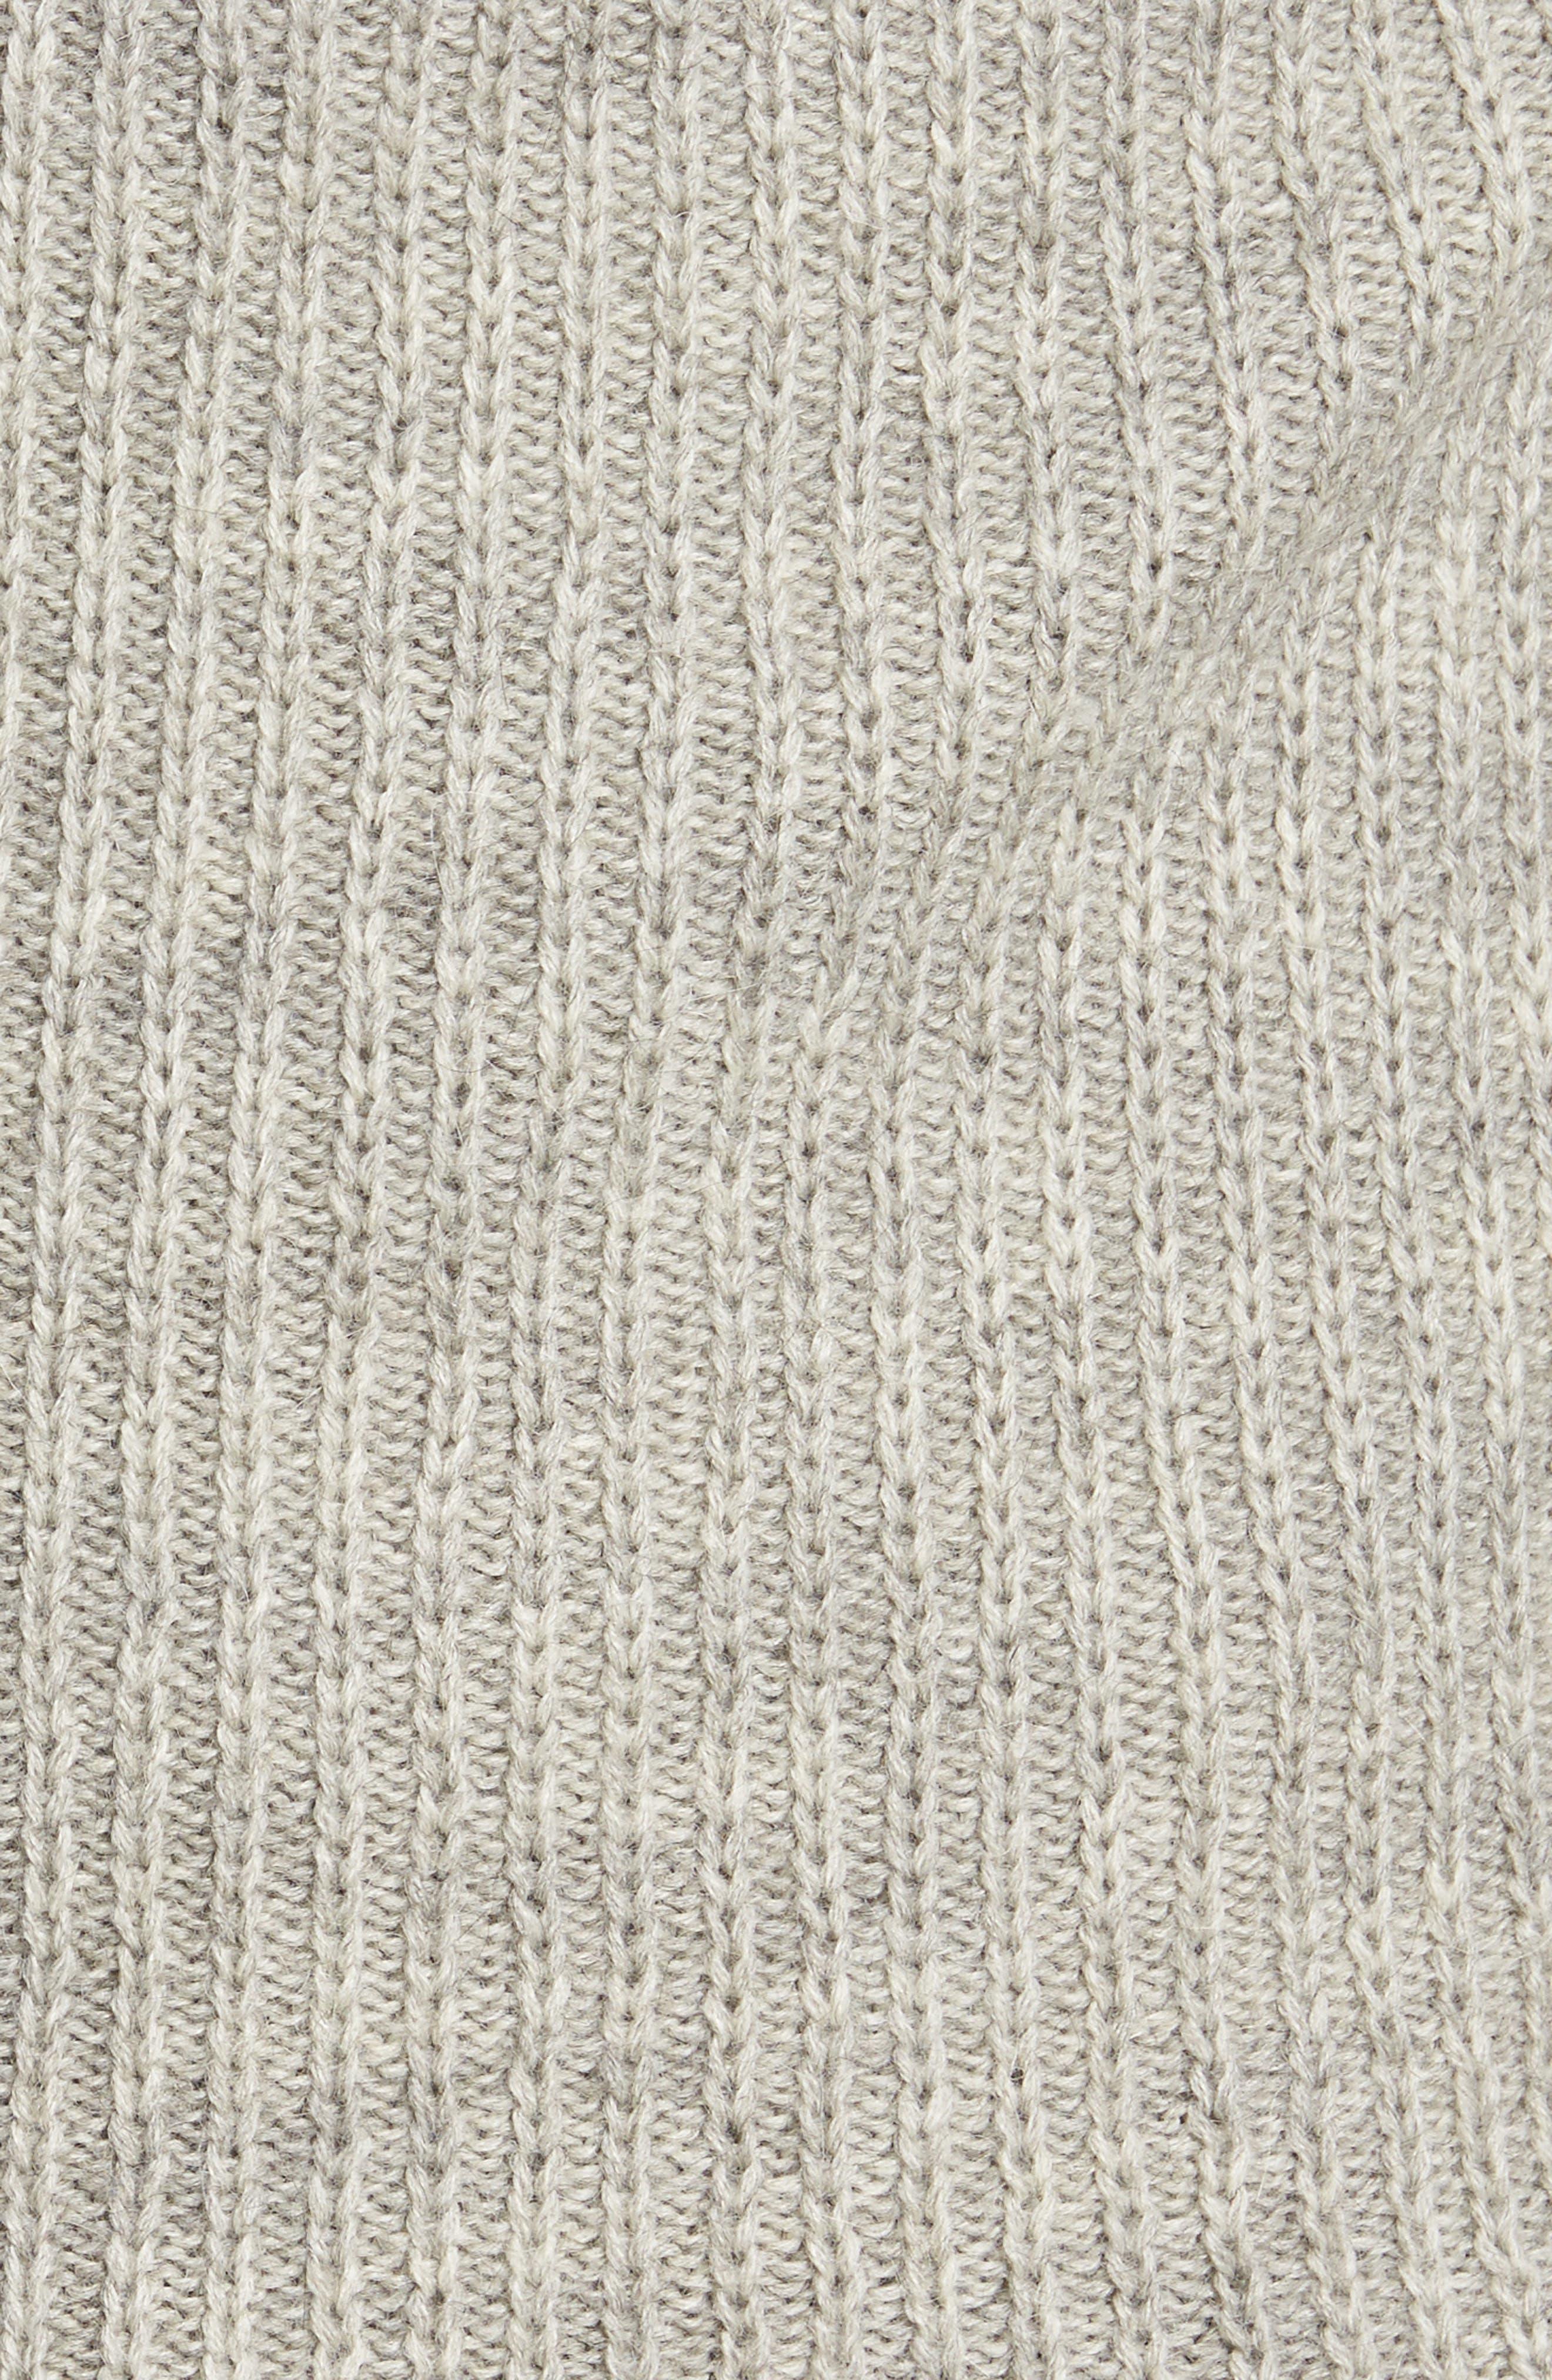 'Huka Lodge' Merino Wool Blend Quarter Zip Sweater,                             Alternate thumbnail 5, color,                             268